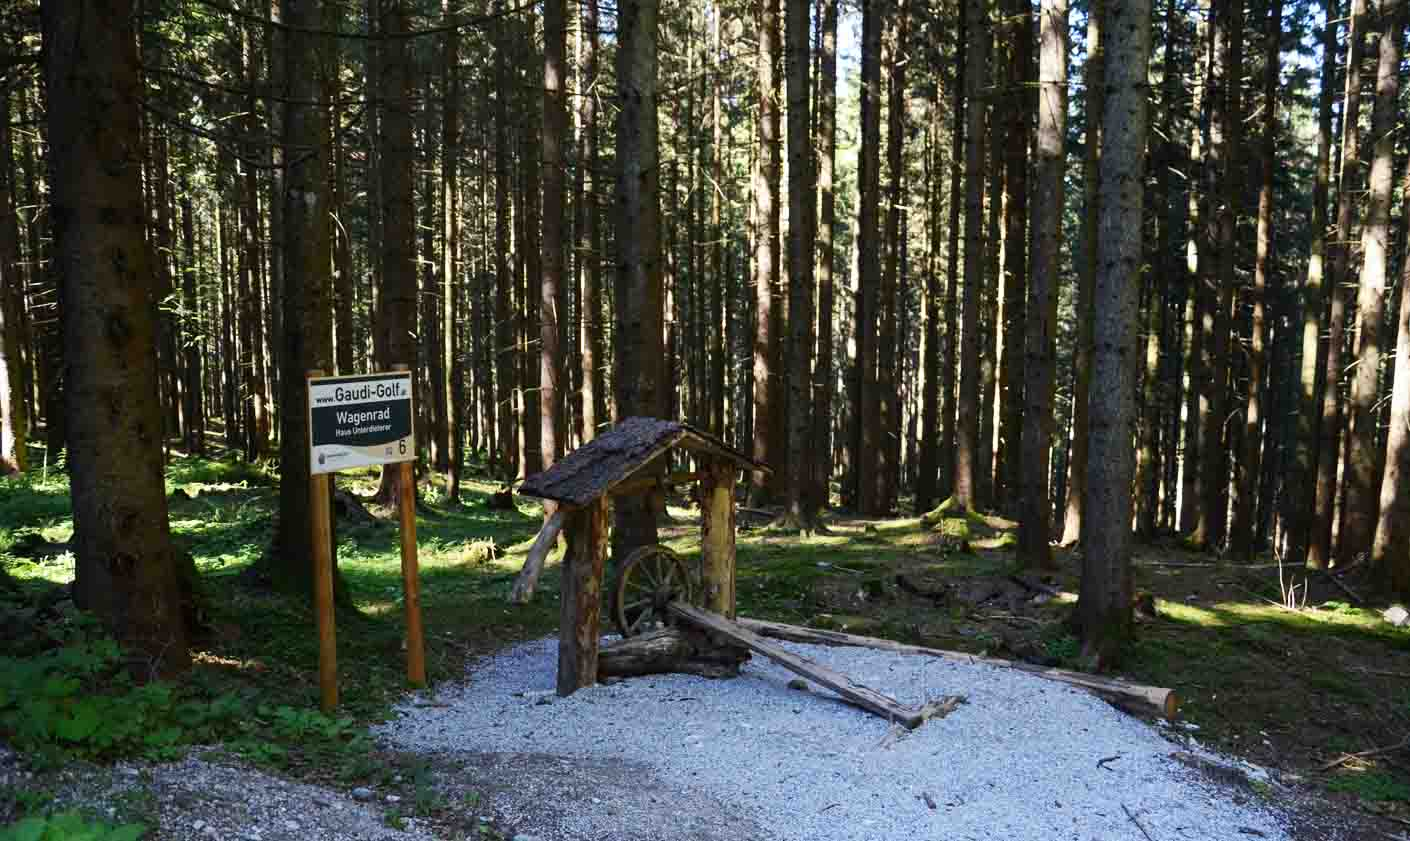 Station im Wald